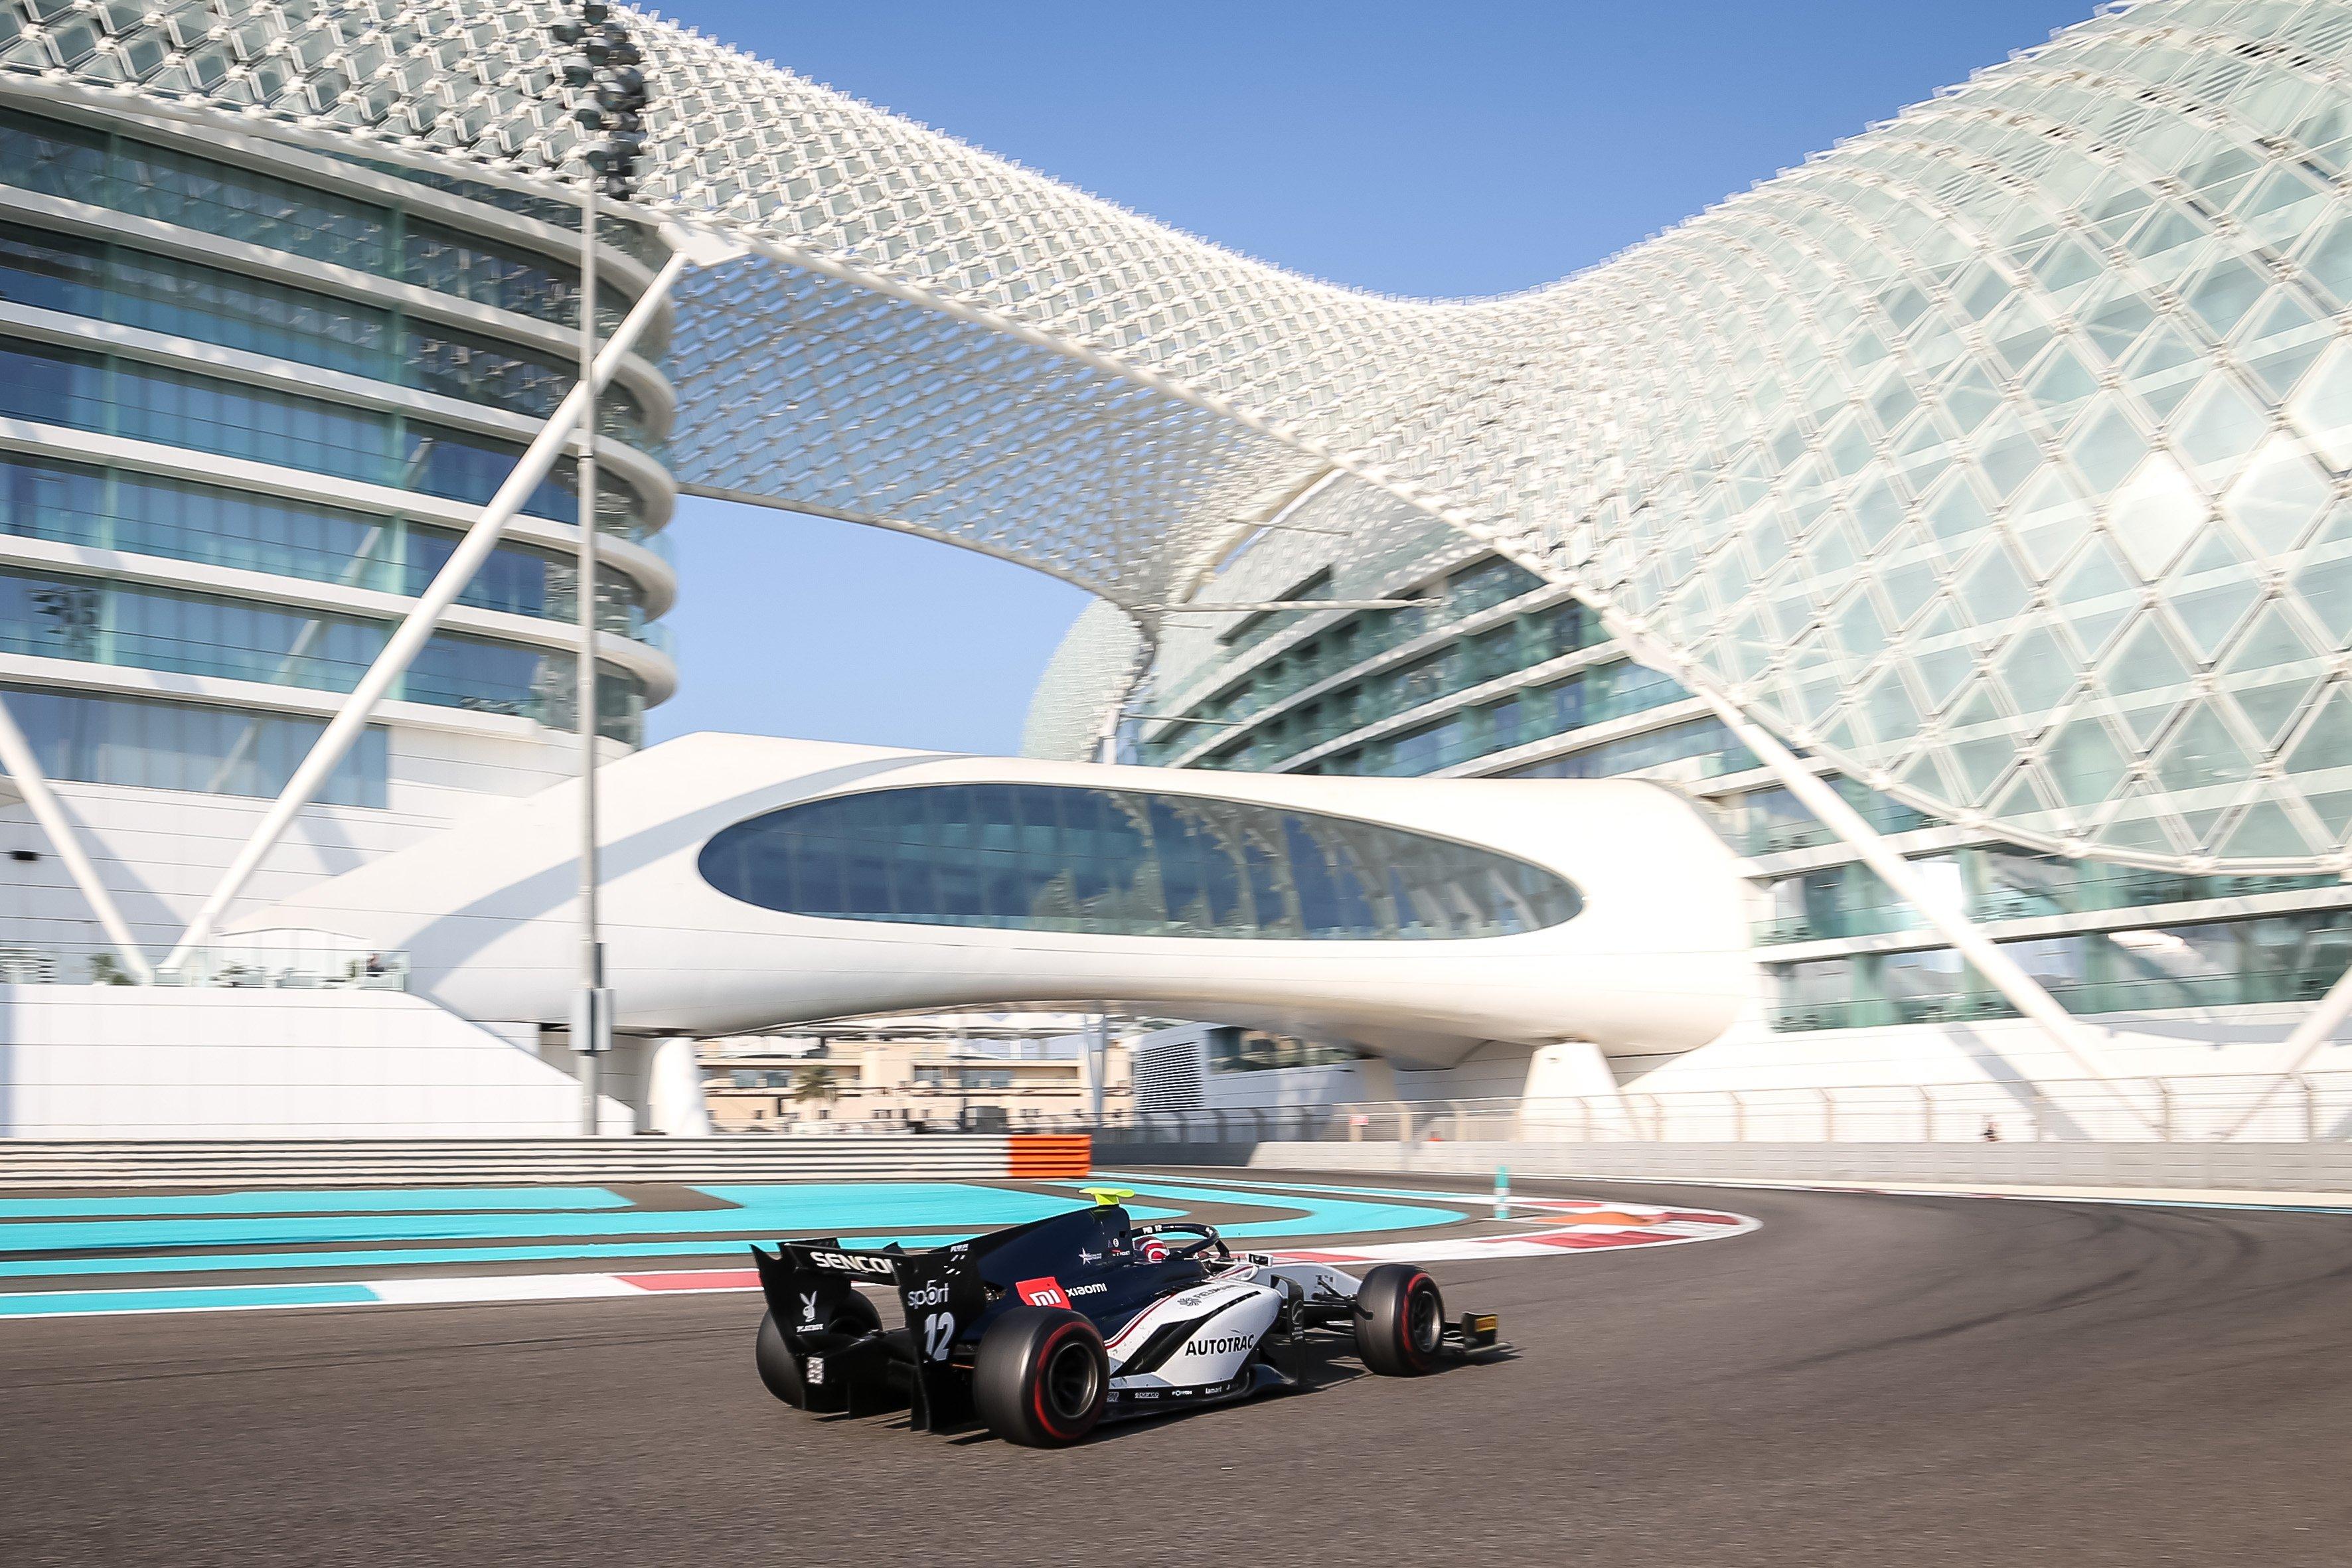 Делетраз занял первое место по итогам второго дня тестов «Формулы-2» в Абу-Даби, Шварцман на второй строчке